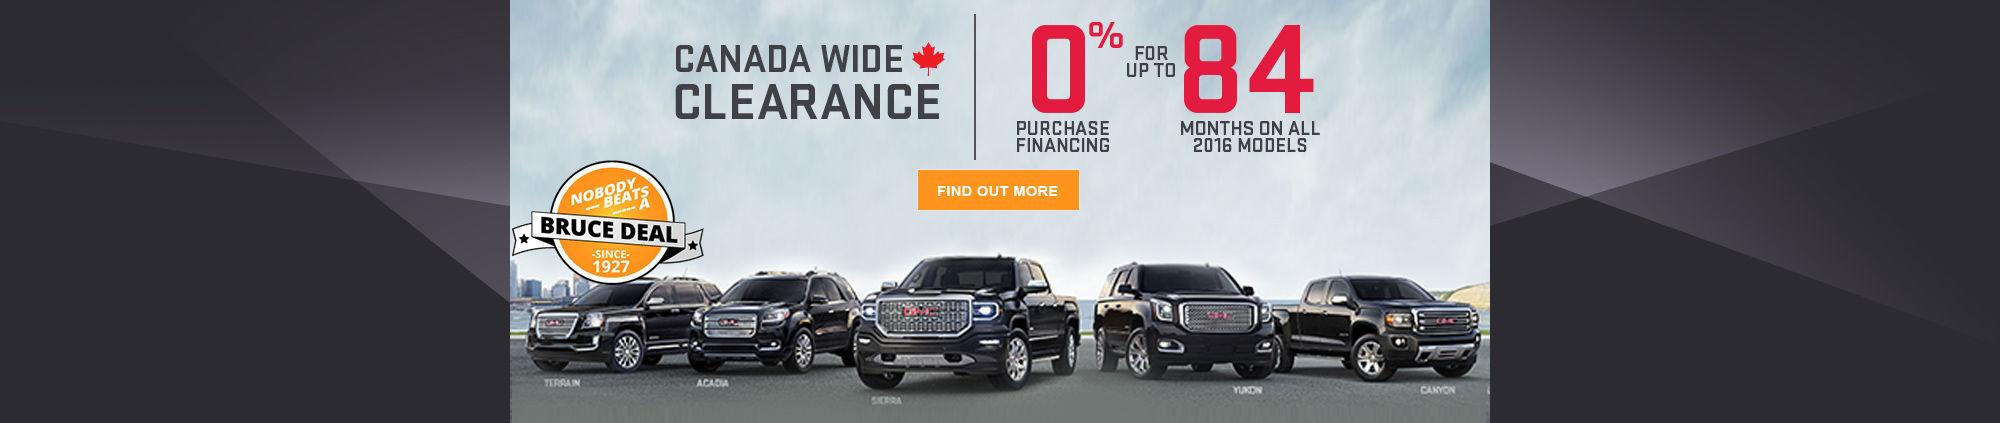 Canada Wide Clearance - GMC